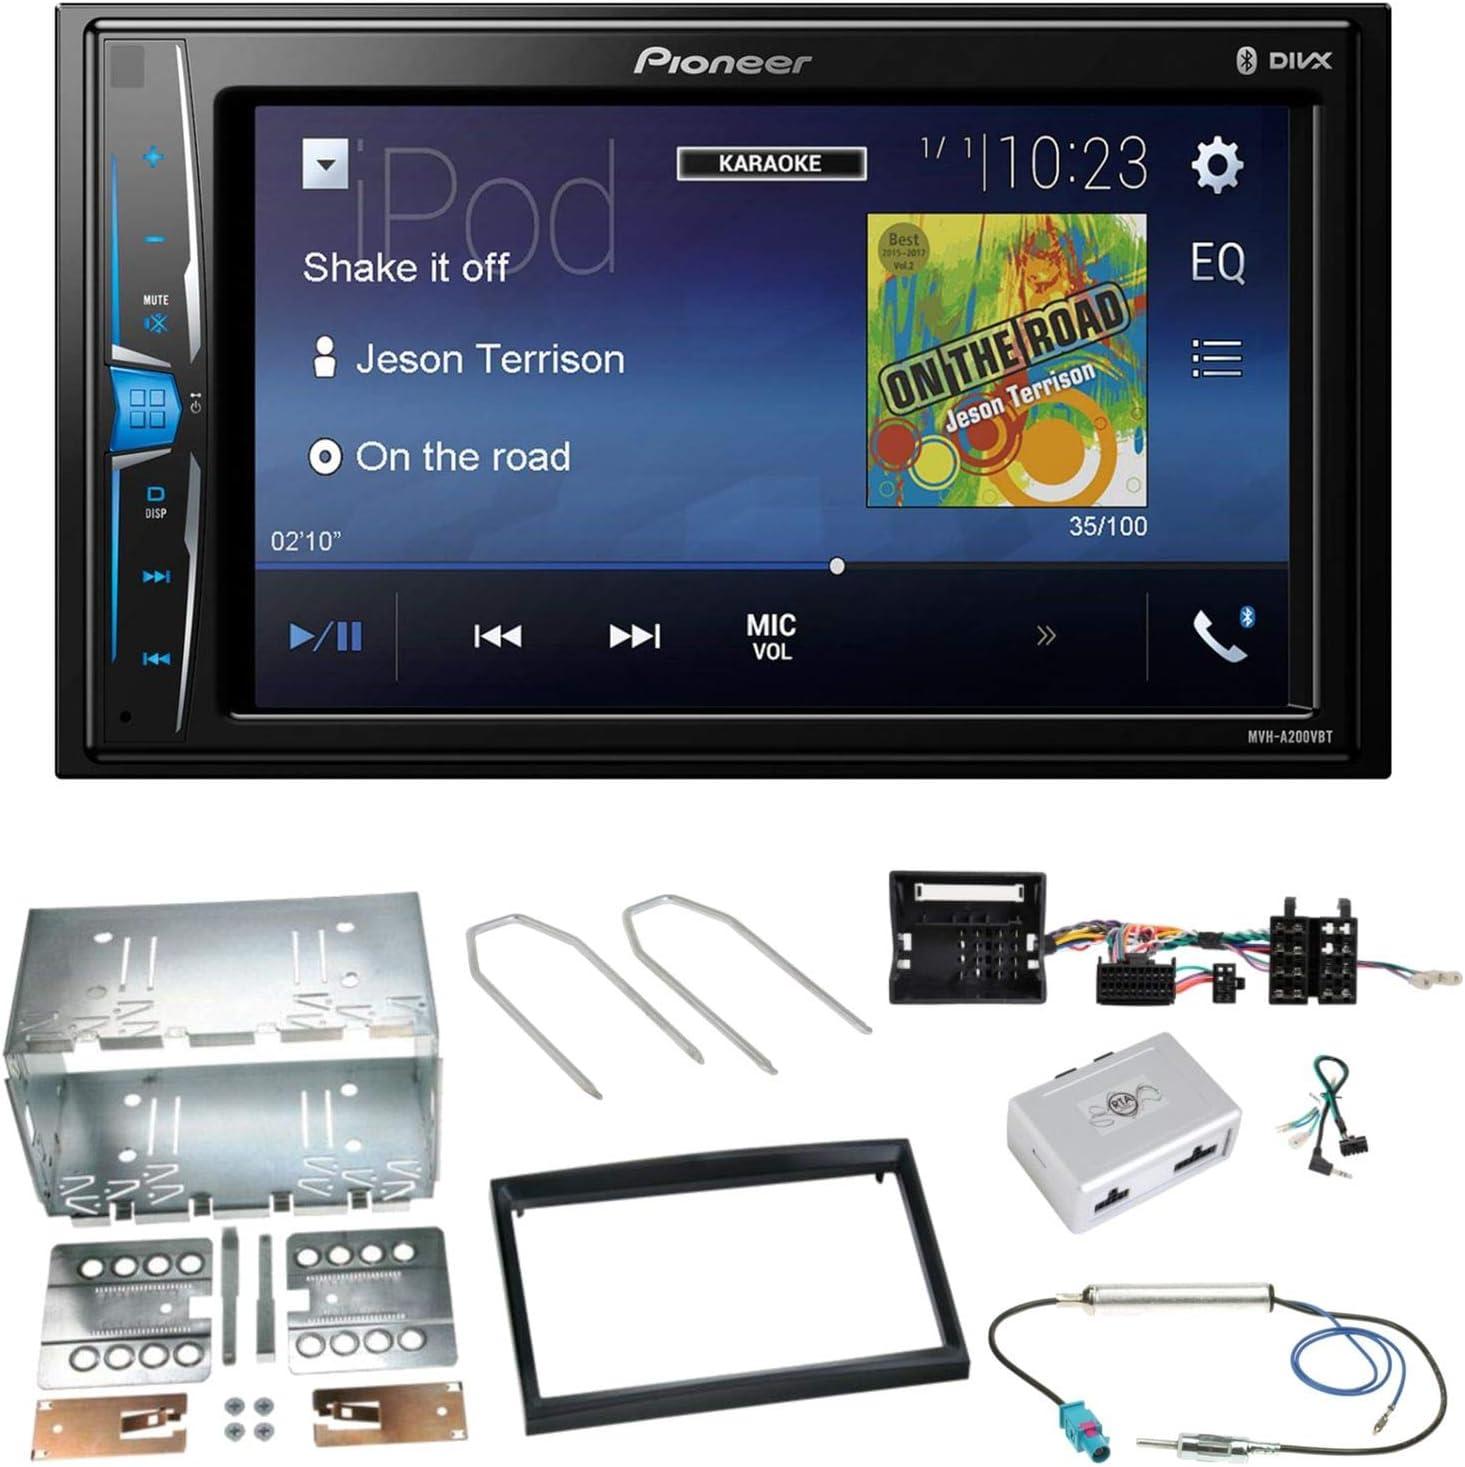 Pioneer Mvh A200 Vbt Usb Bluetooth Mp3 Wma Car Stereo Elektronik